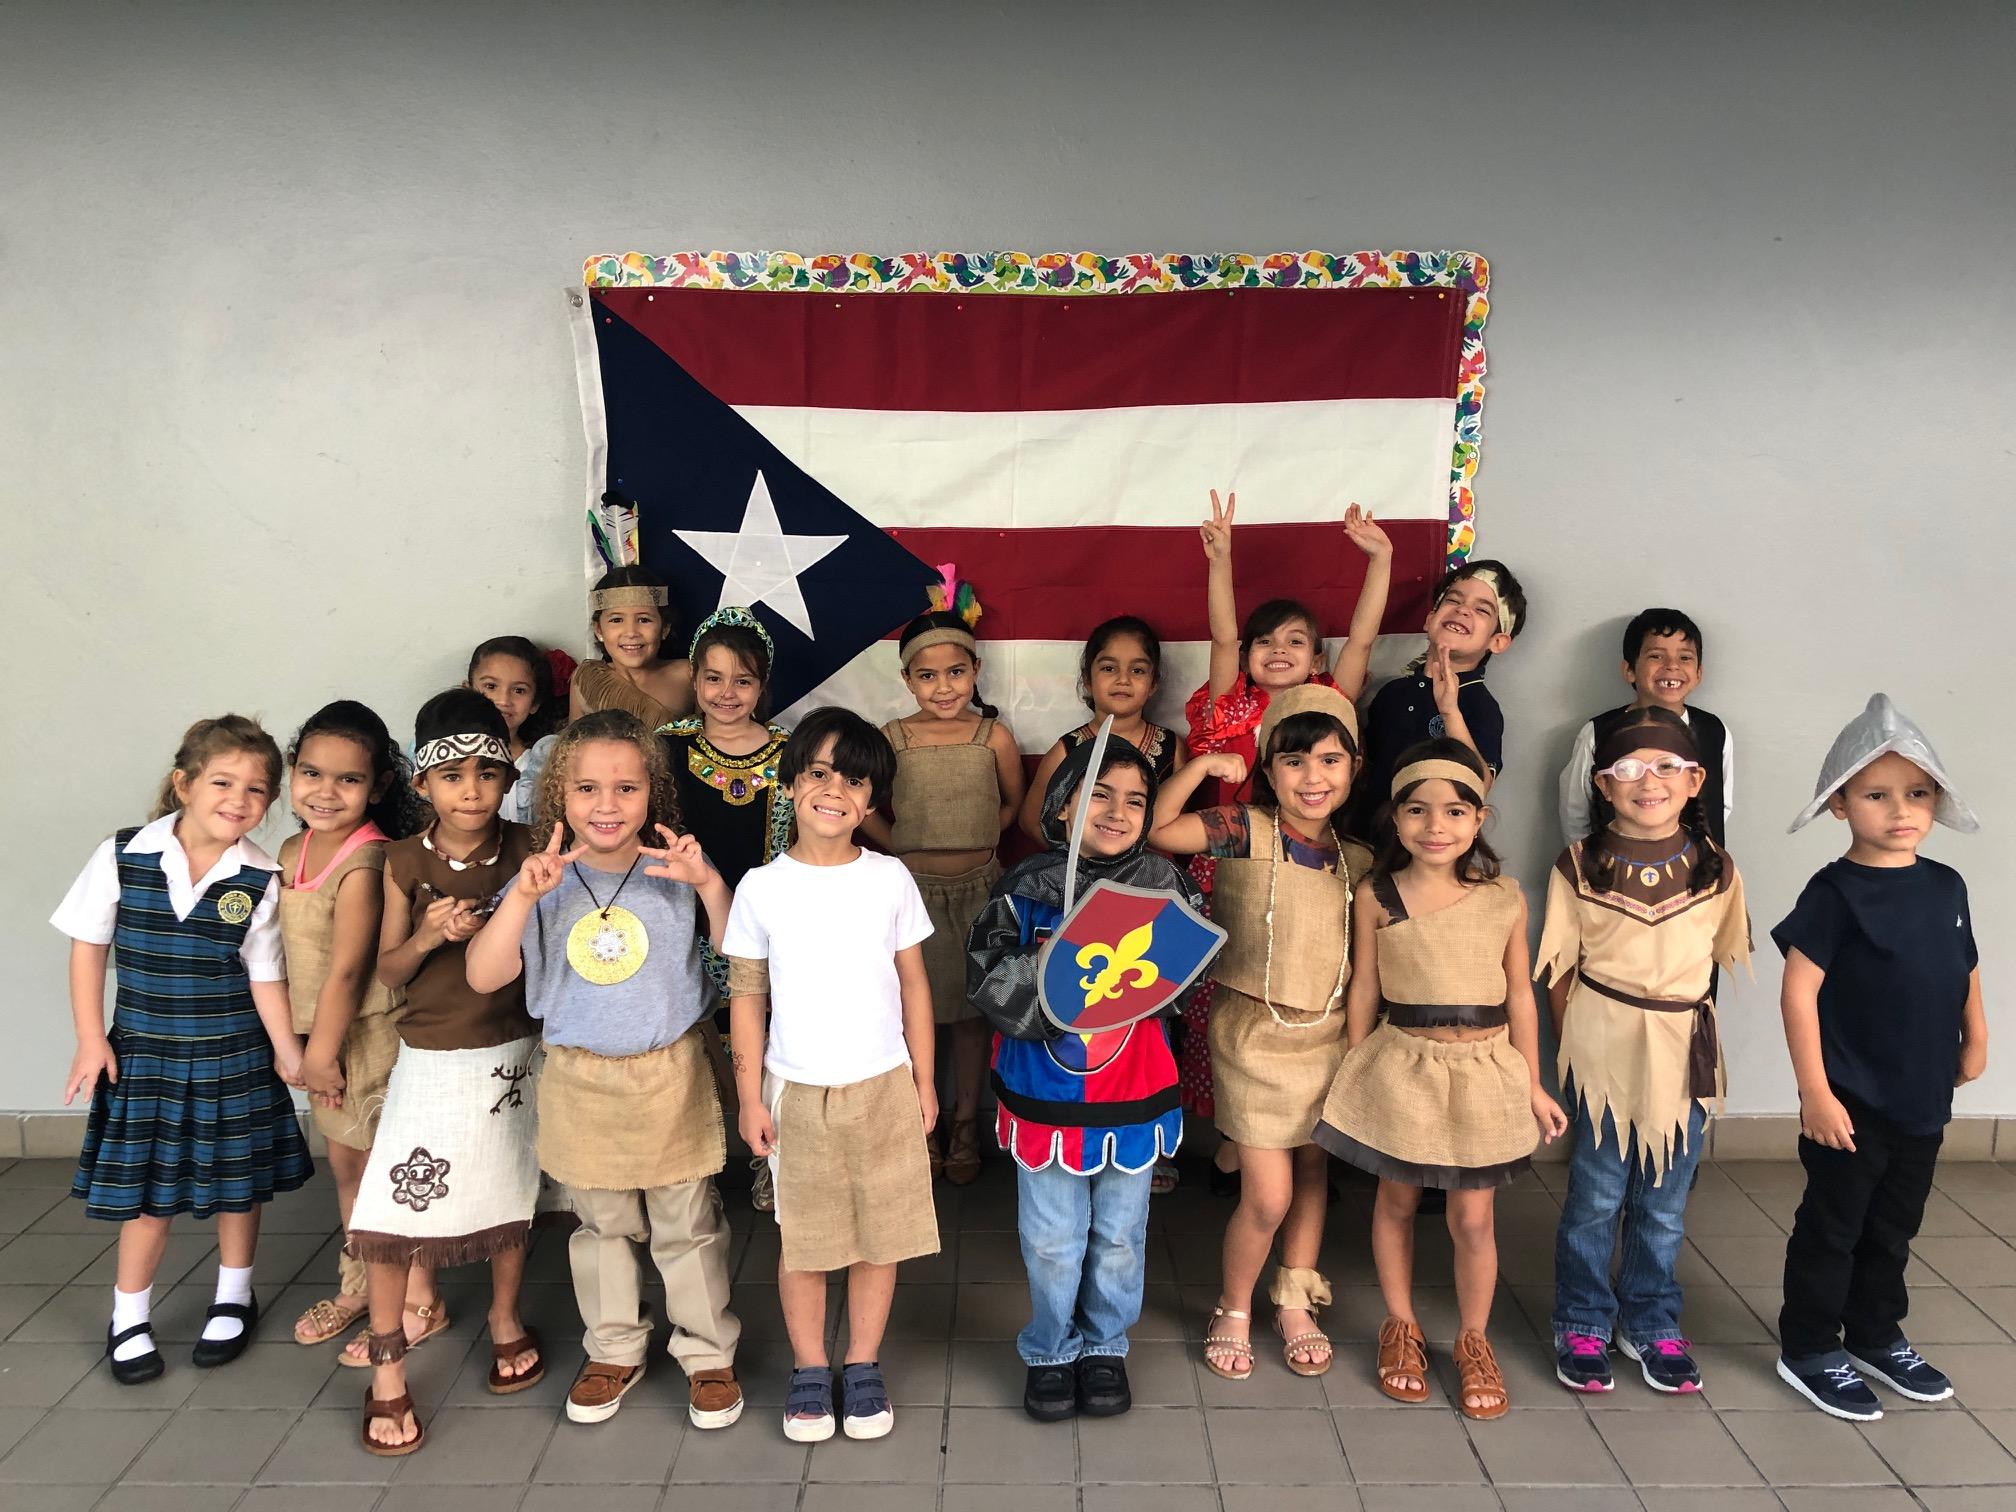 Taino Indians